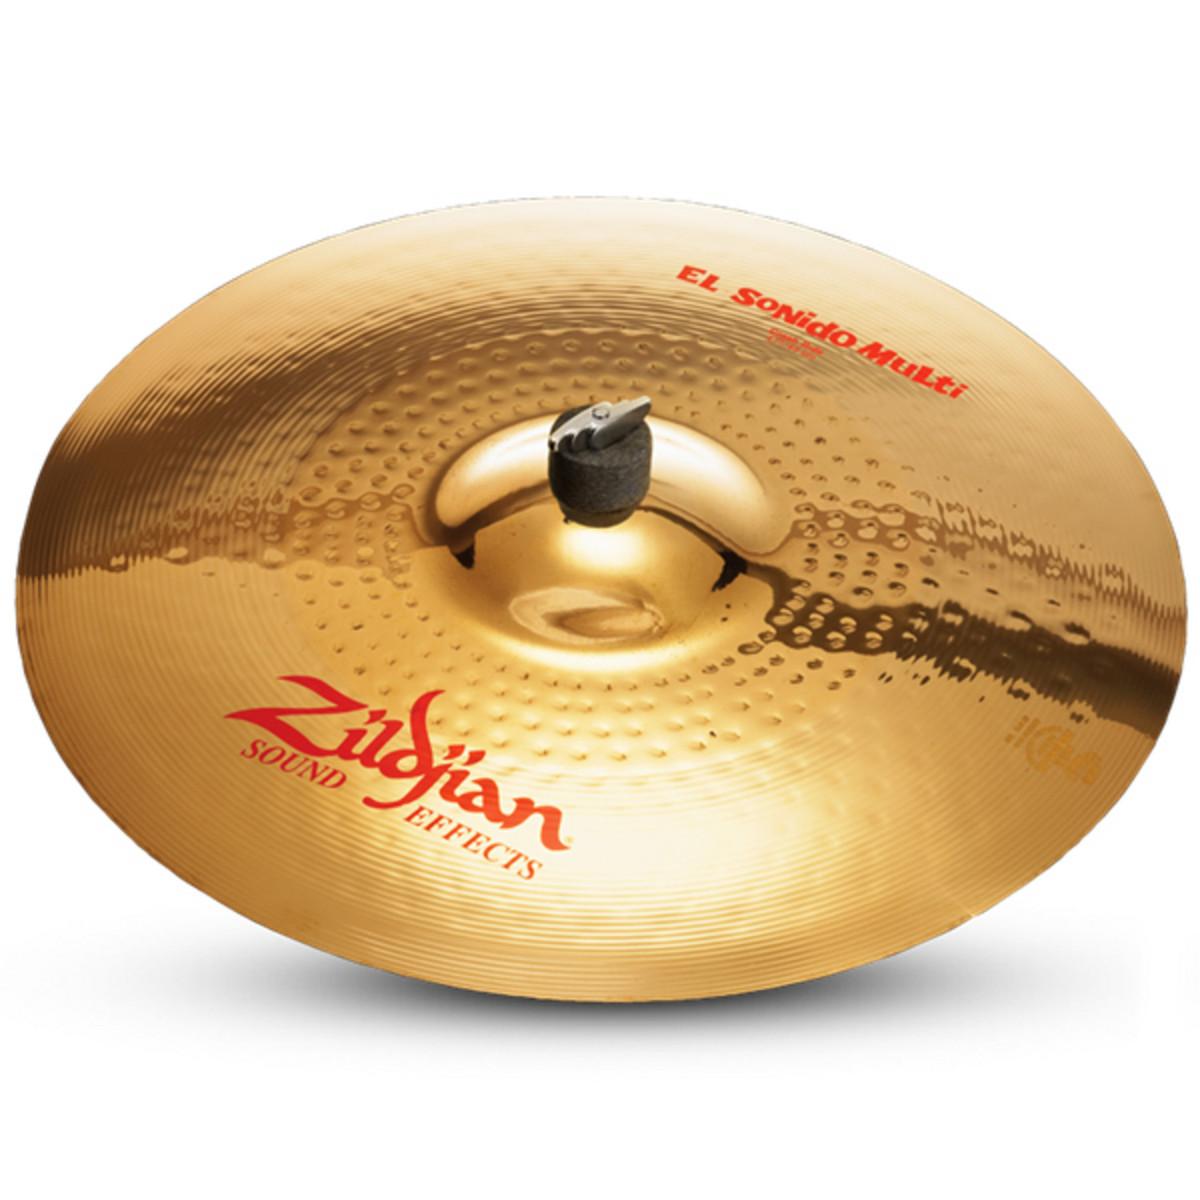 zildjian a 17 39 39 el sonido multi crash ride cymbal at gear4music. Black Bedroom Furniture Sets. Home Design Ideas